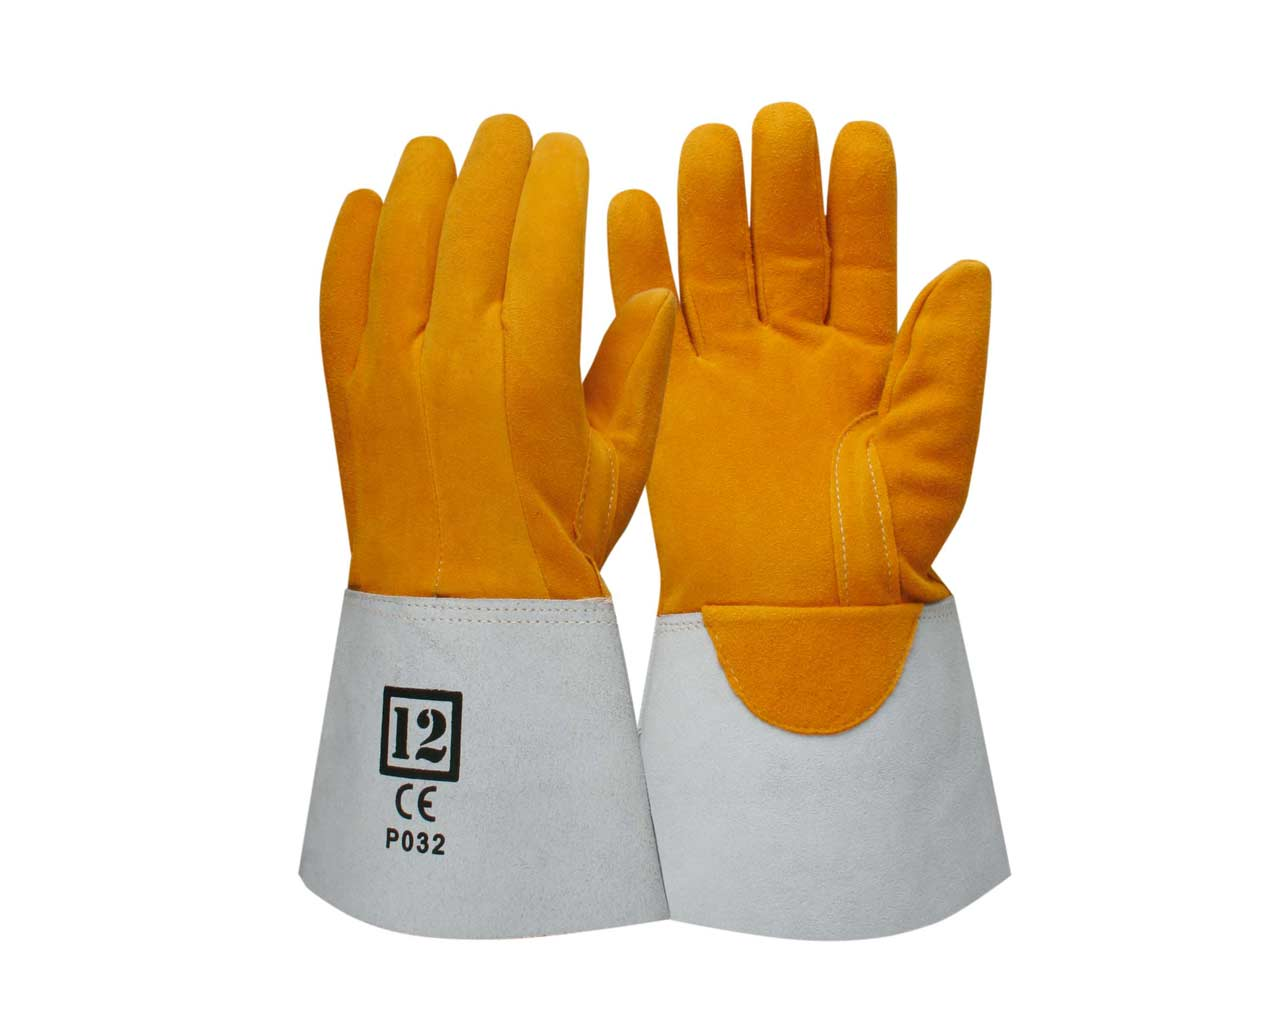 power touch welding glove frontier power touch welding work gloves P032